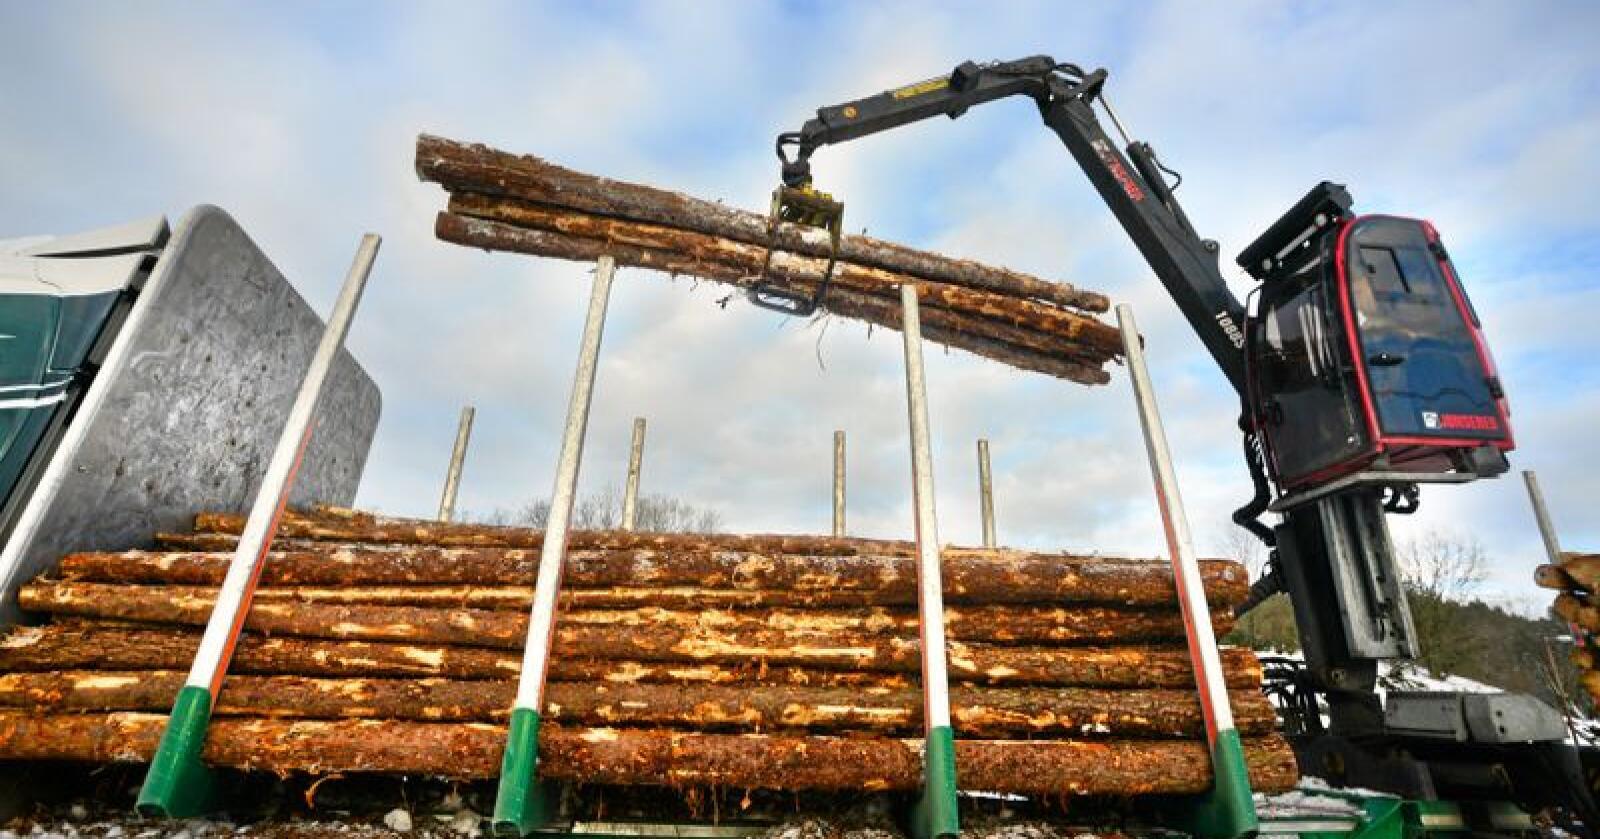 Skog: Viktig kilde til fornybart karbon. Foto: Siri Juell Rasmussen